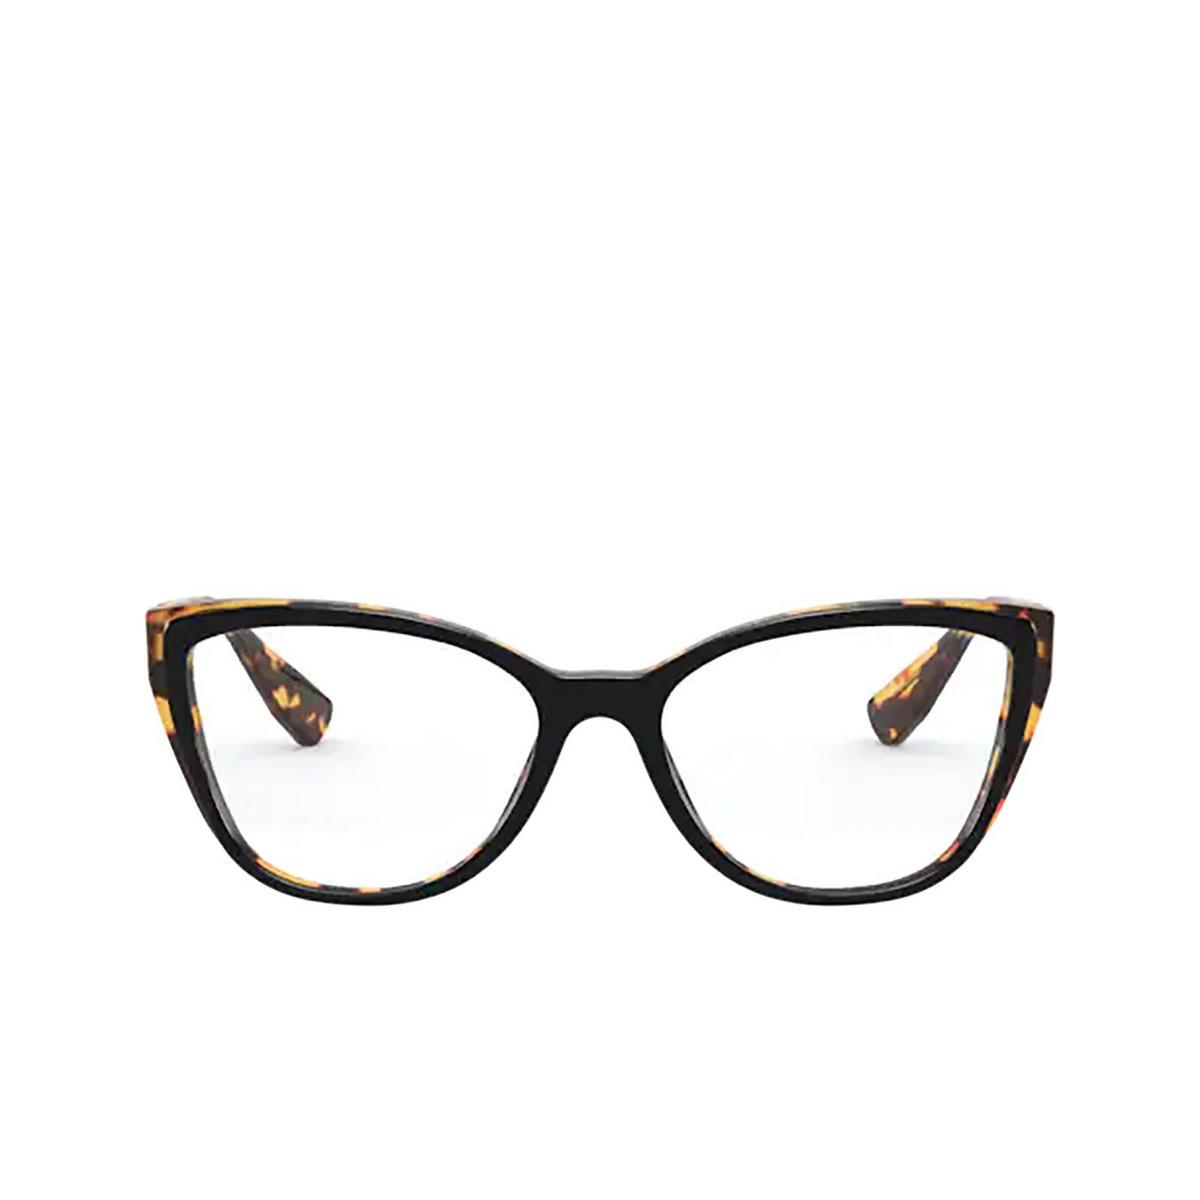 Miu Miu® Butterfly Eyeglasses: Core Collection MU 04SV color Top Black / Light Havana 3891O1 - front view.